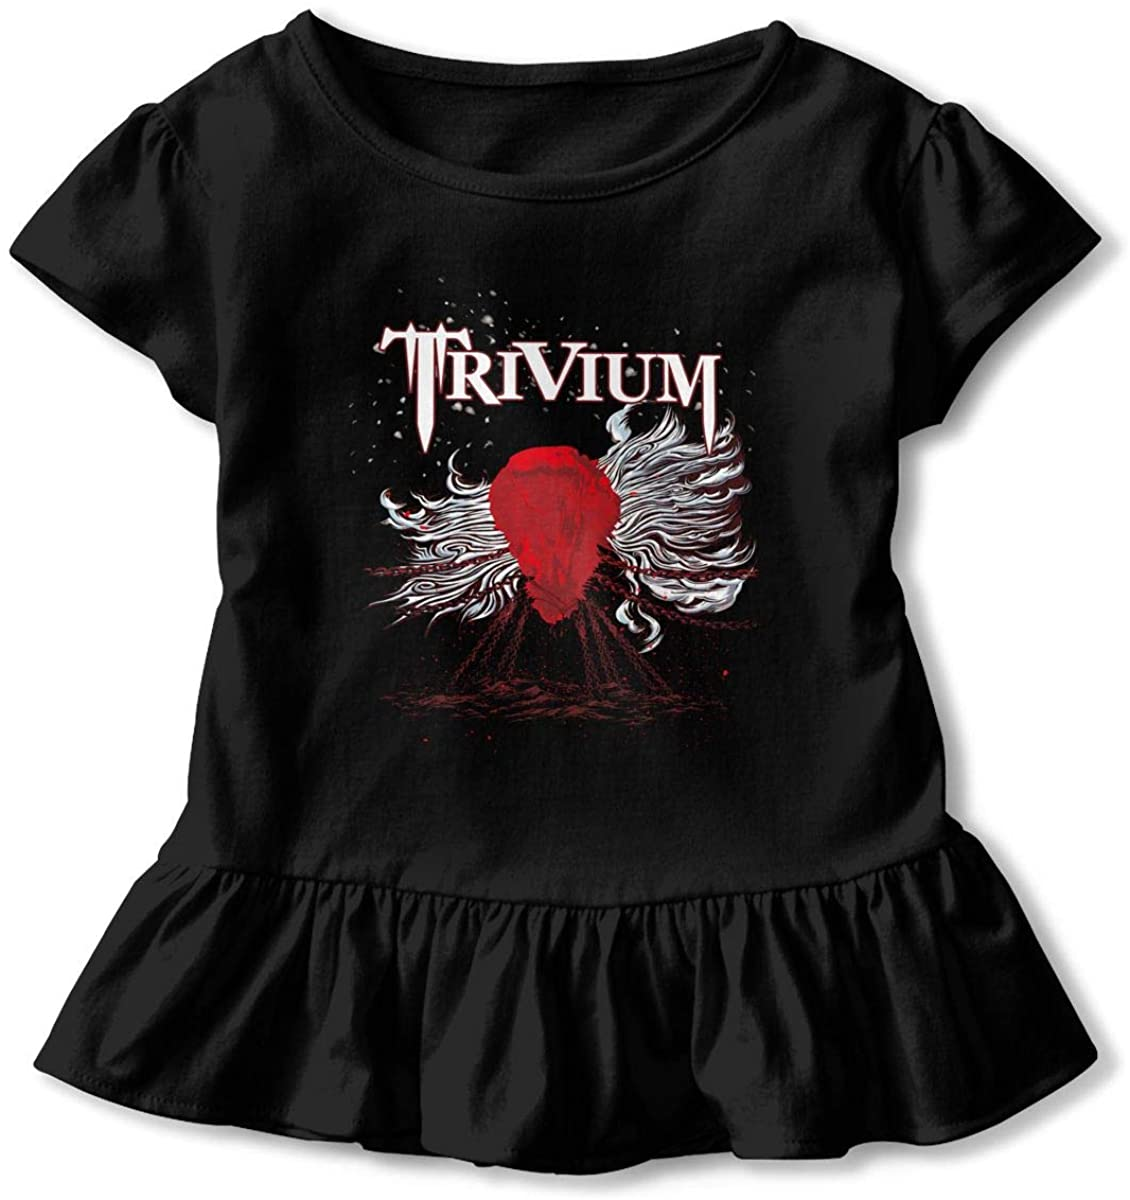 AP.Room Trivium Toddler Girl's Ruffle T-Shirt Short Sleeve 2-6t